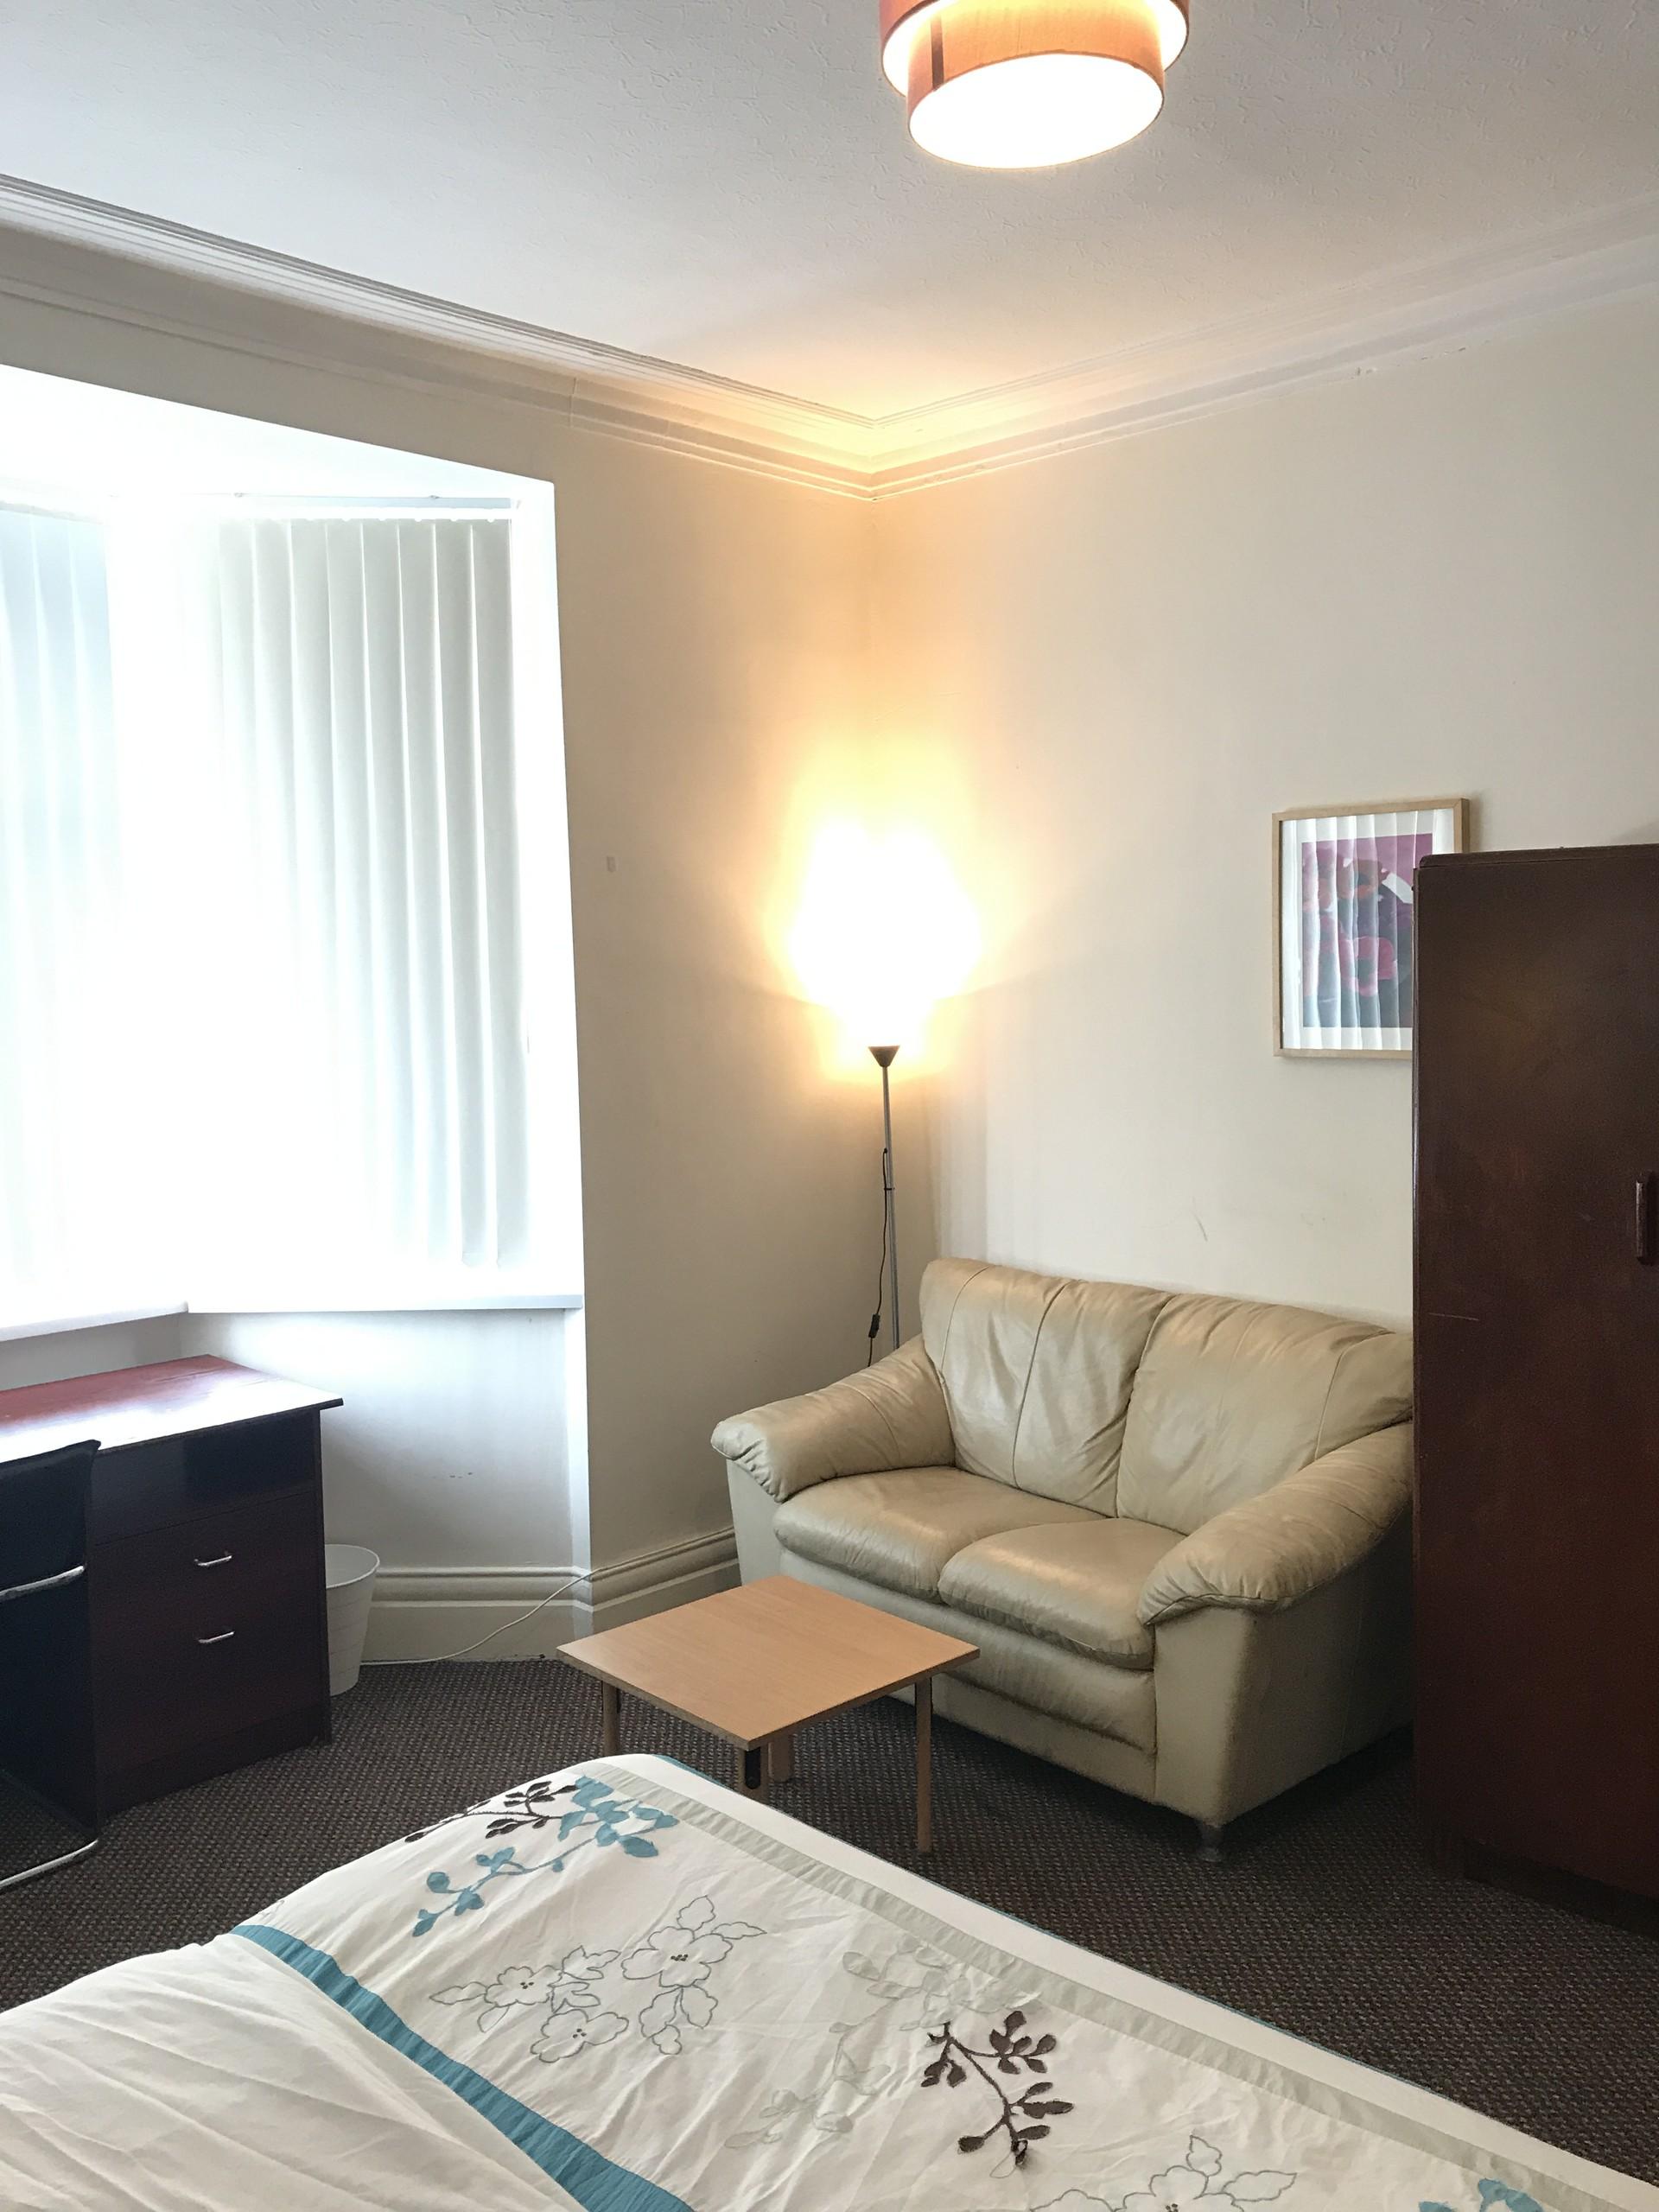 160 Wingrove Rd, Newcastle upon Tyne NE4 9BX, UK